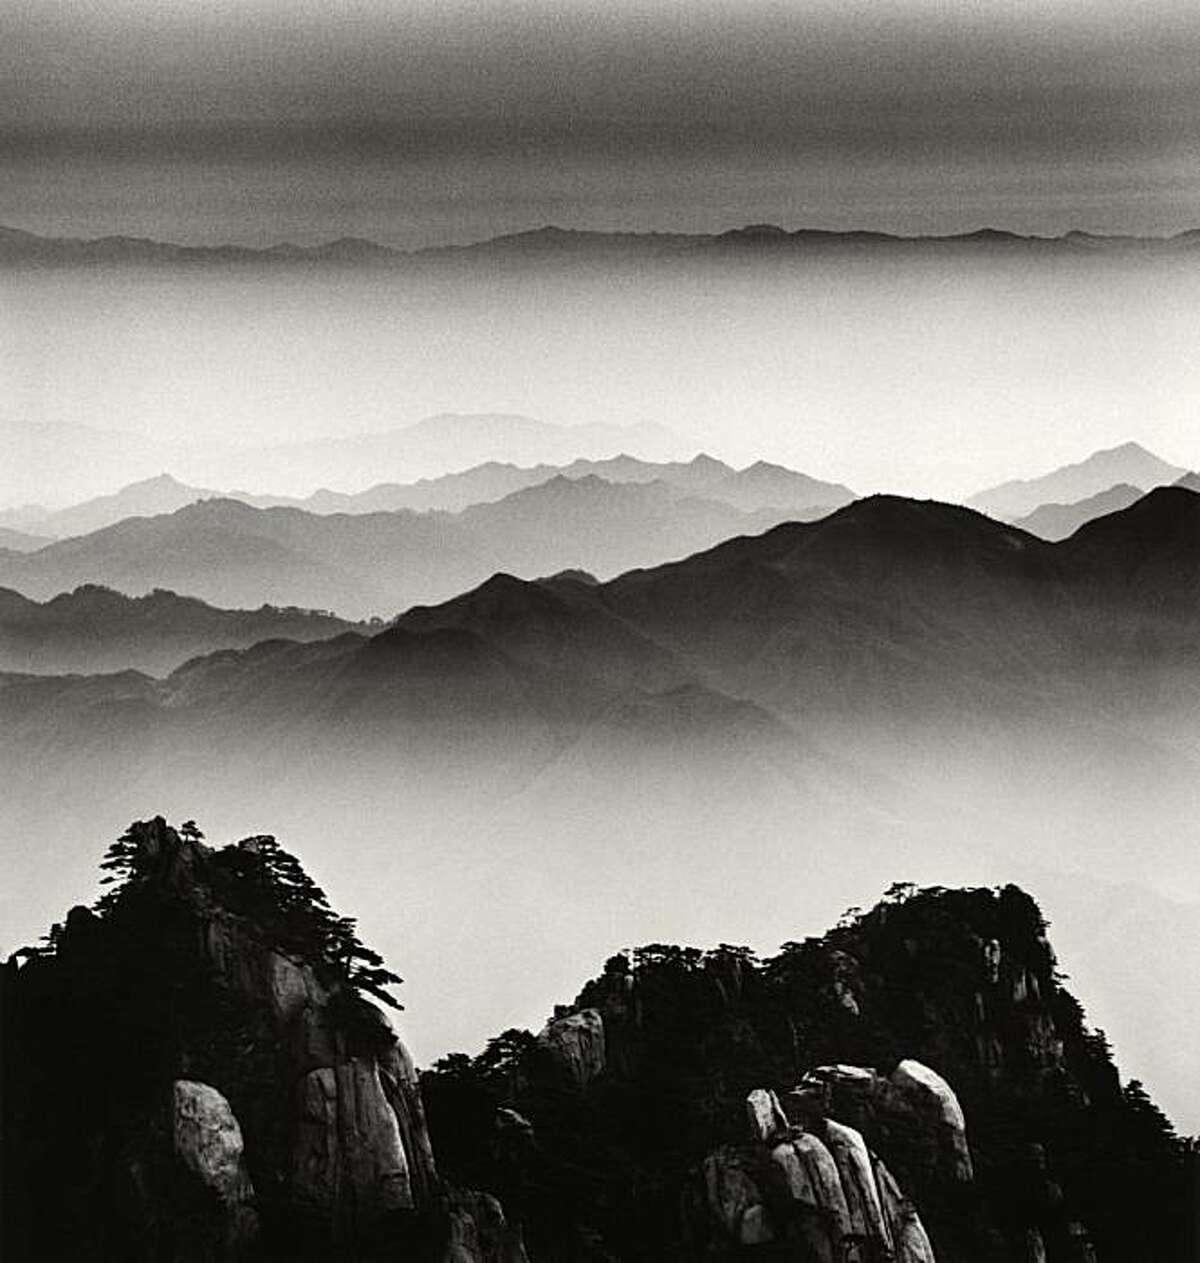 """Huangshan Mountains, Study 12, Anhui"" (2008) gelatin silver print by Michael Kenna"